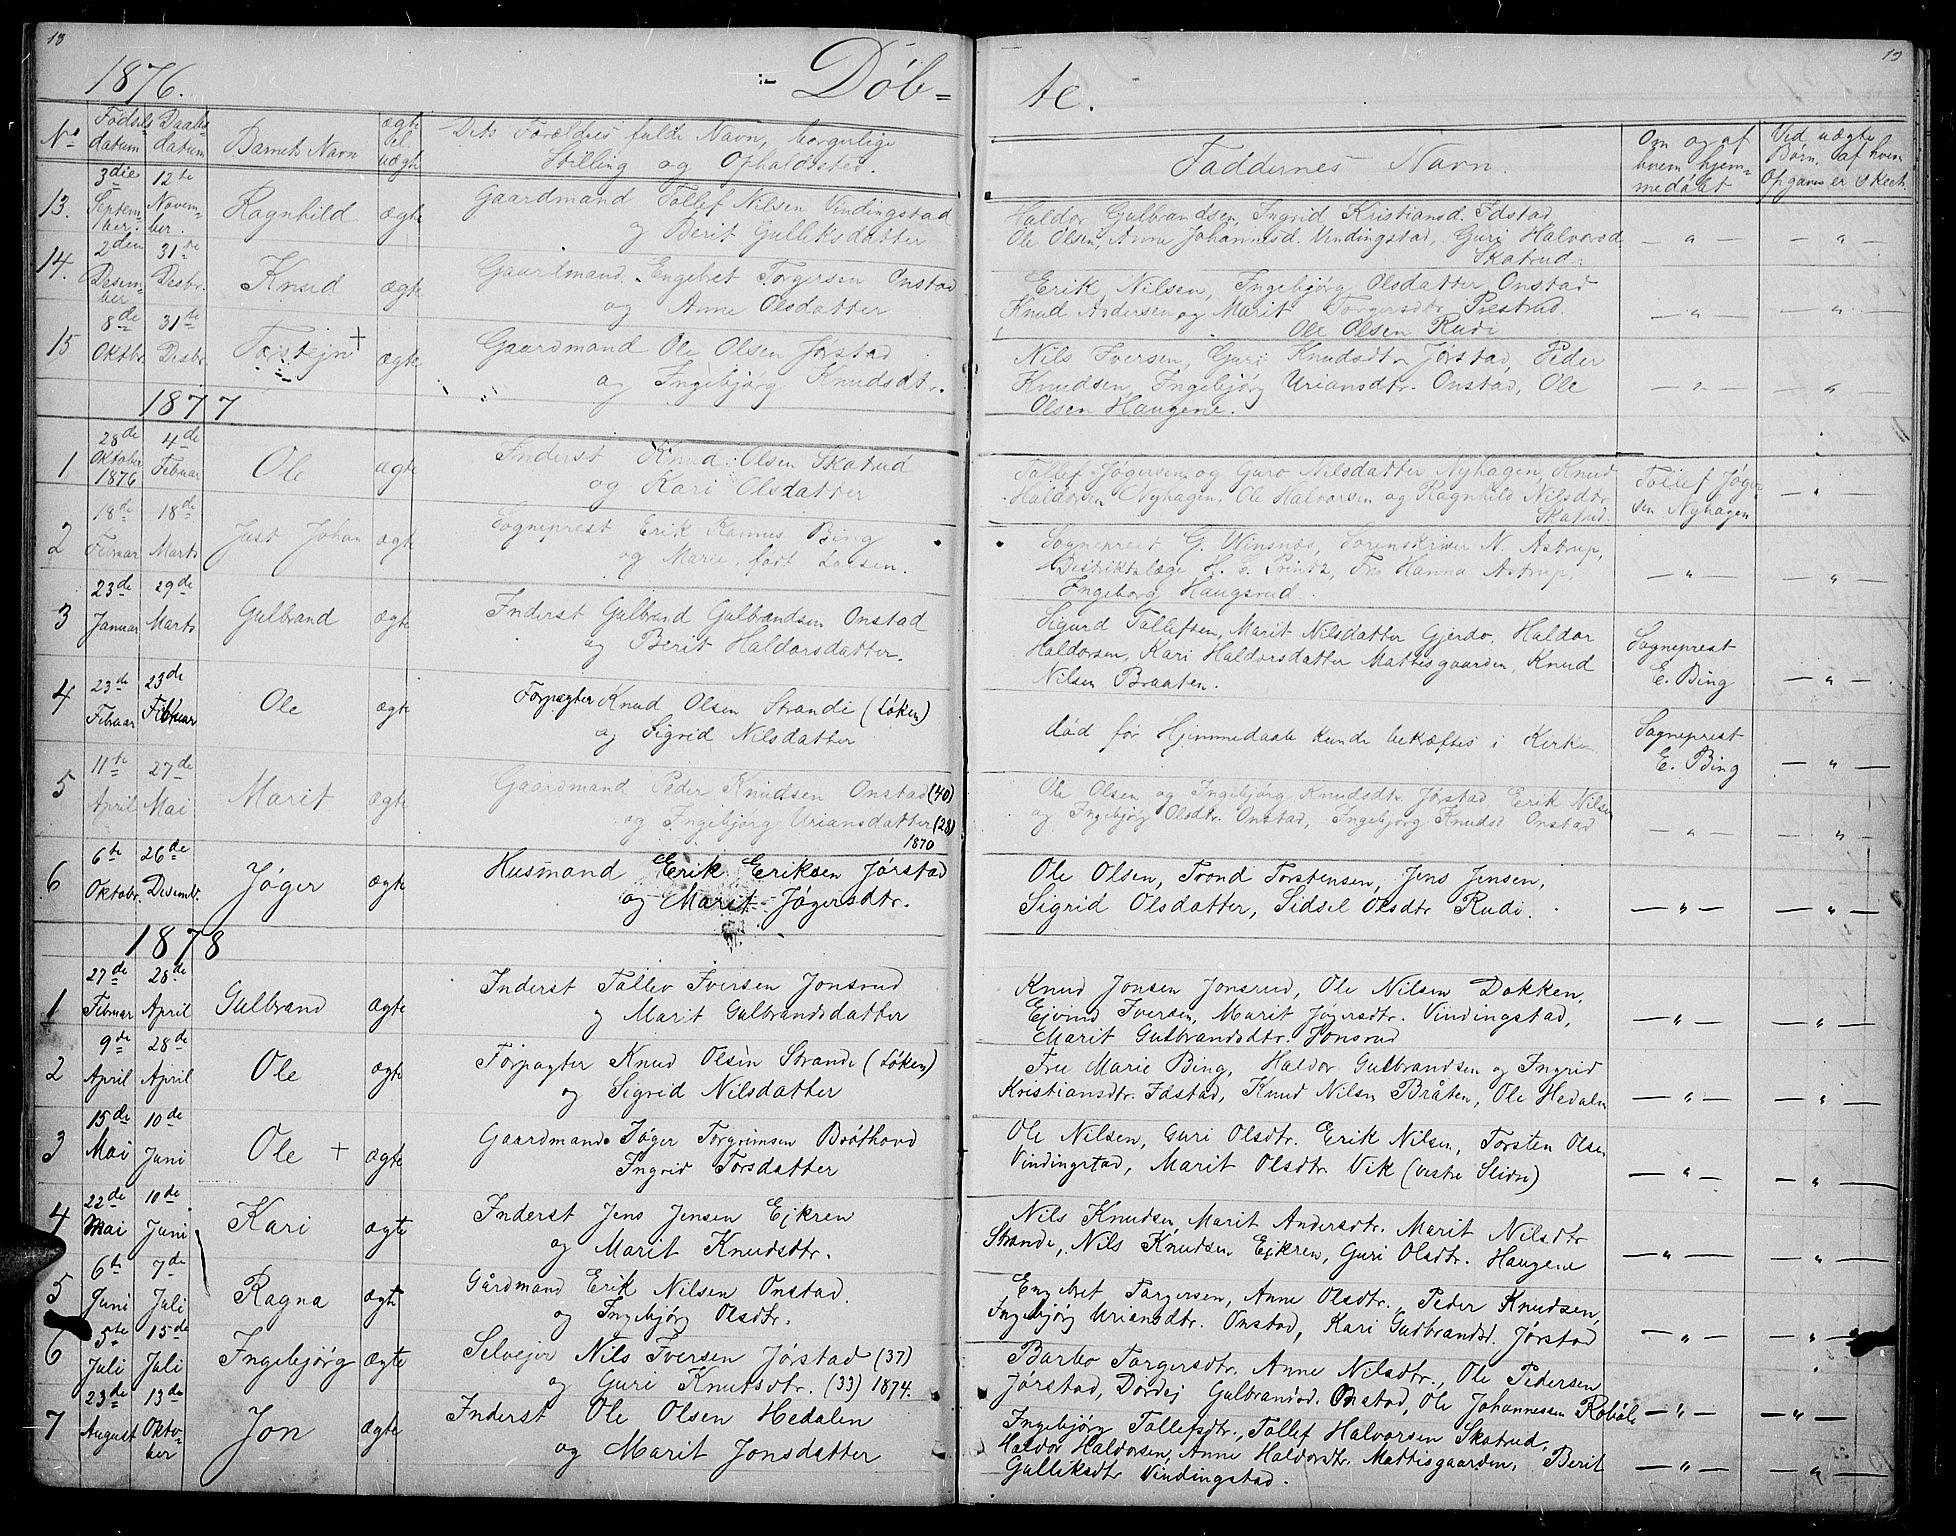 SAH, Øystre Slidre prestekontor, Klokkerbok nr. 2, 1866-1886, s. 18-19